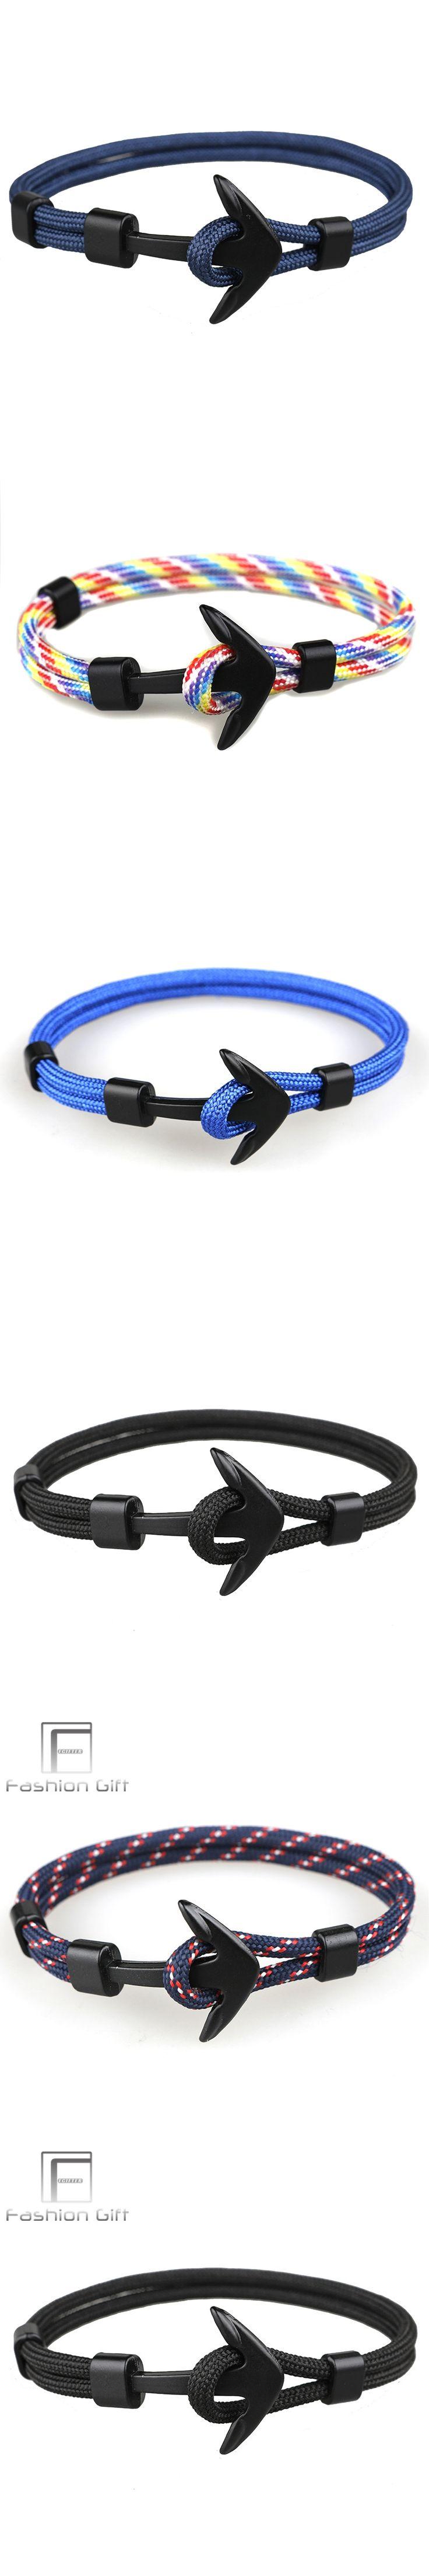 Navy Black Anchor Bracelets Camping Parachute Cord Survival Paracord Bracelet Handmade Jewelry